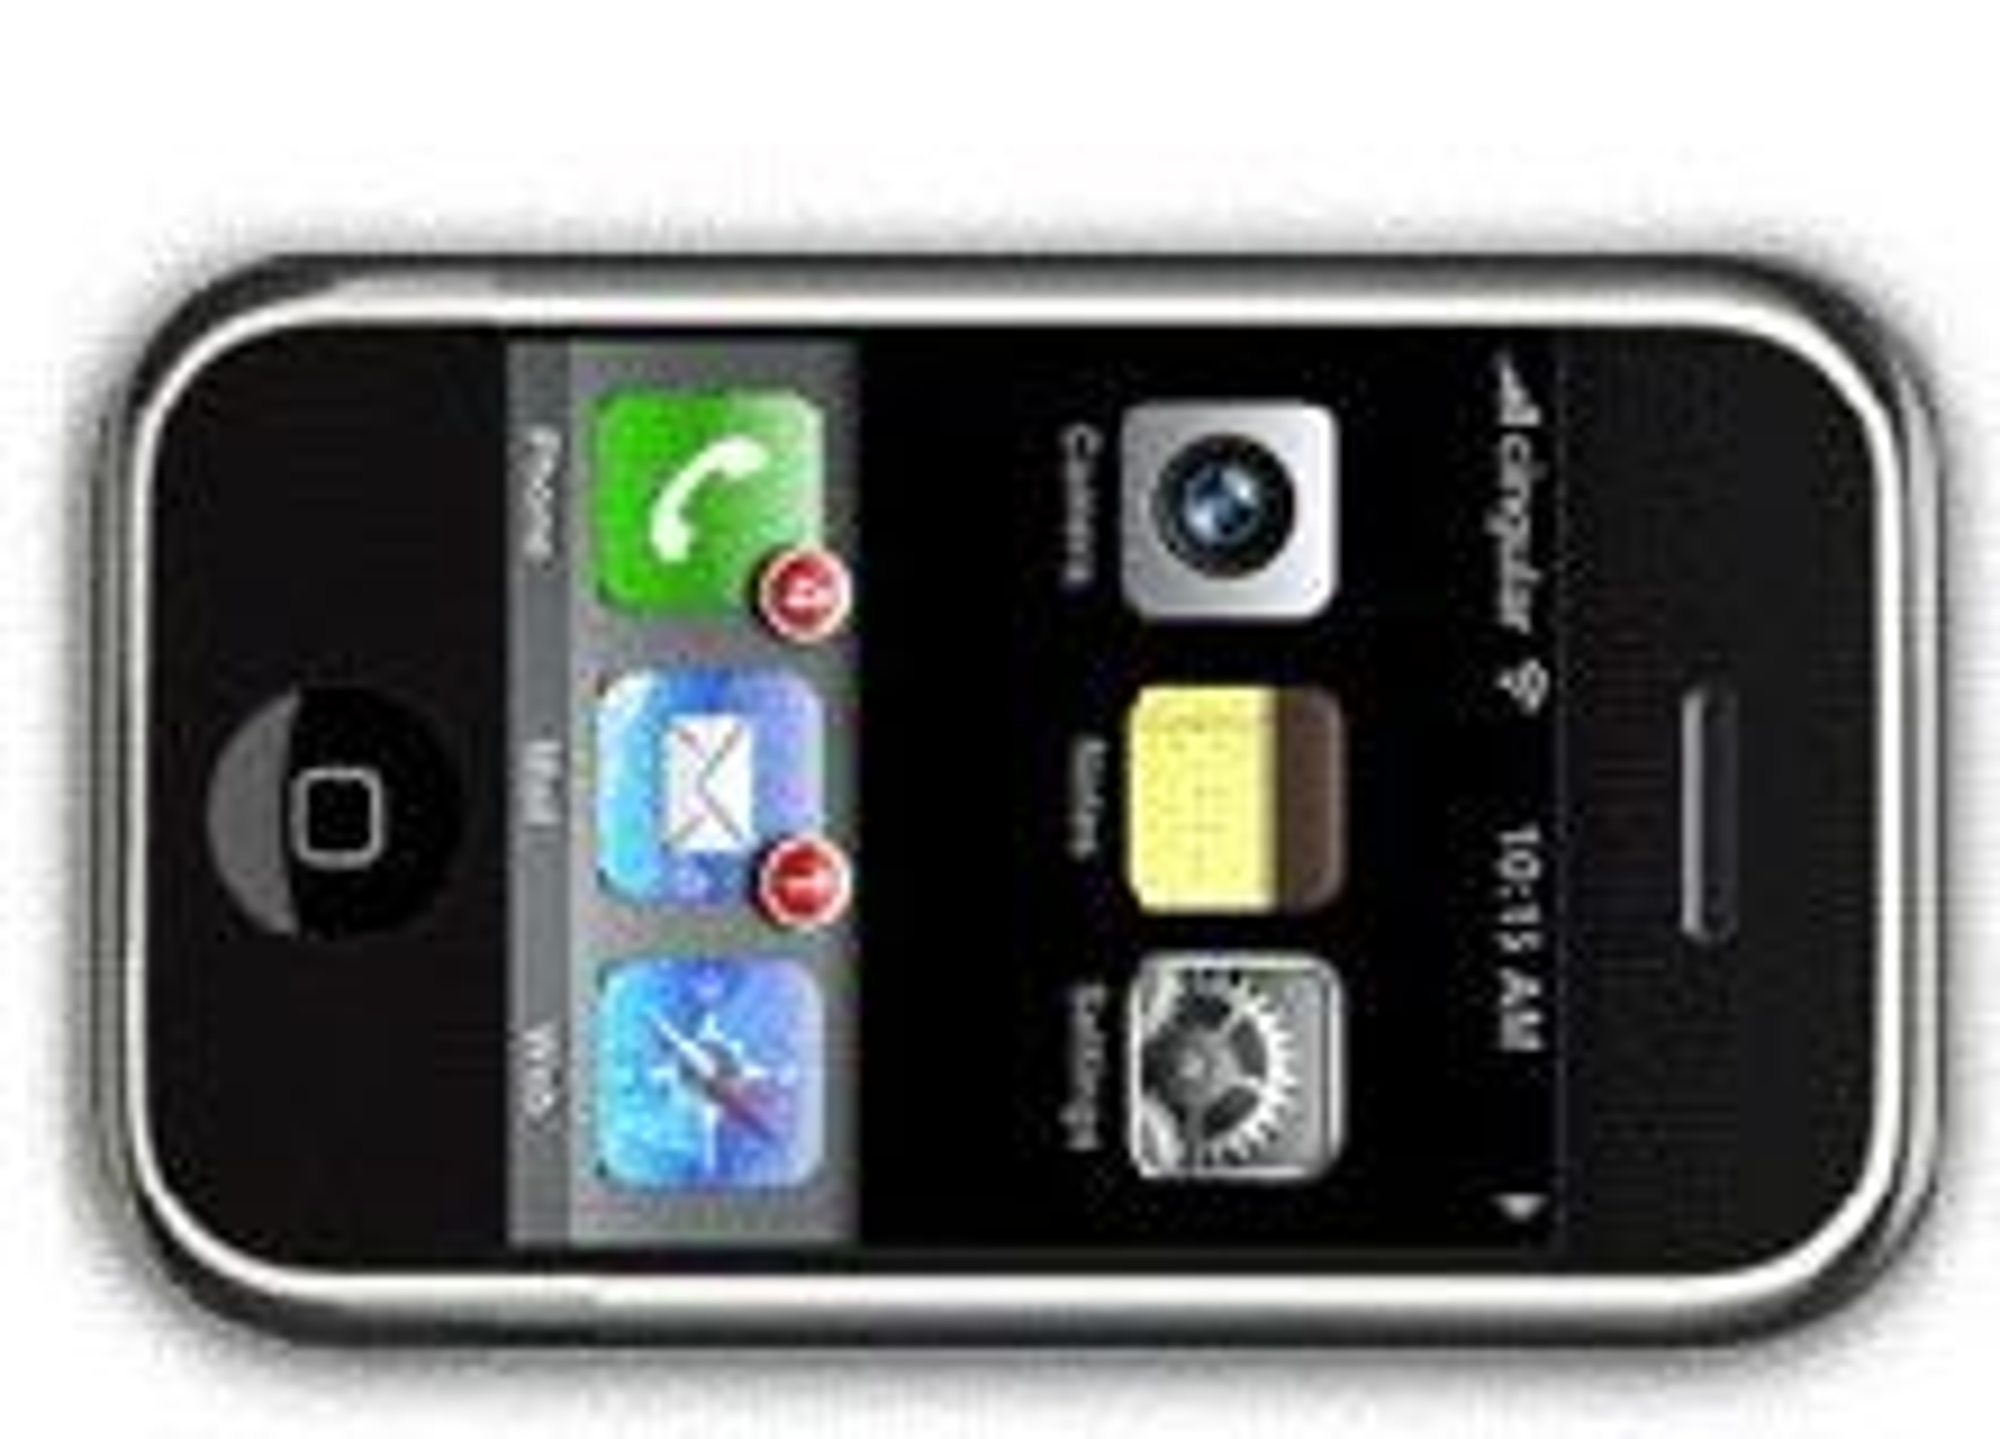 Dette er nok ikke iPhone Nano.